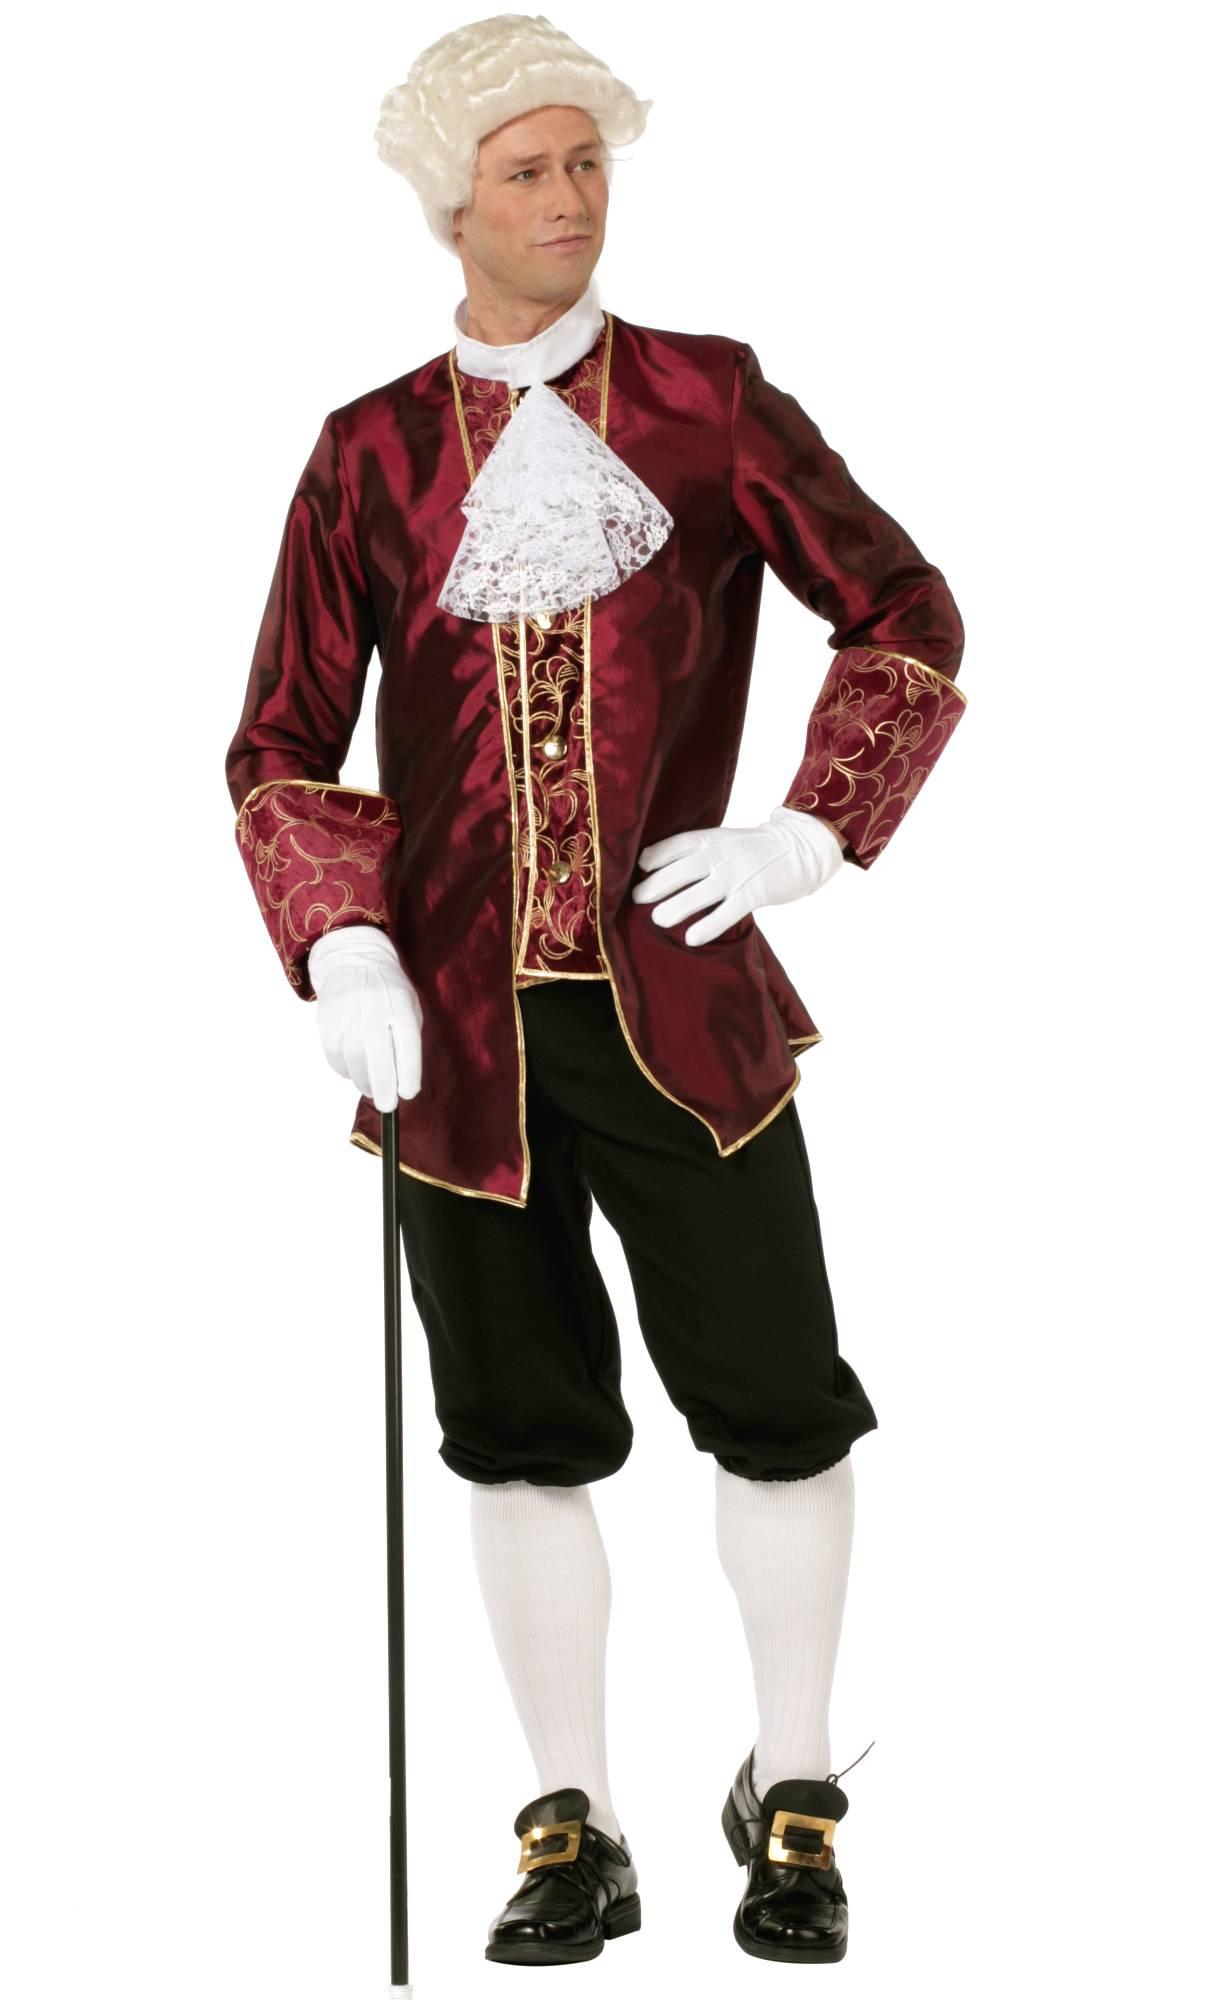 v19927 grande bordeaux Costume marquis taille RqUzzgw